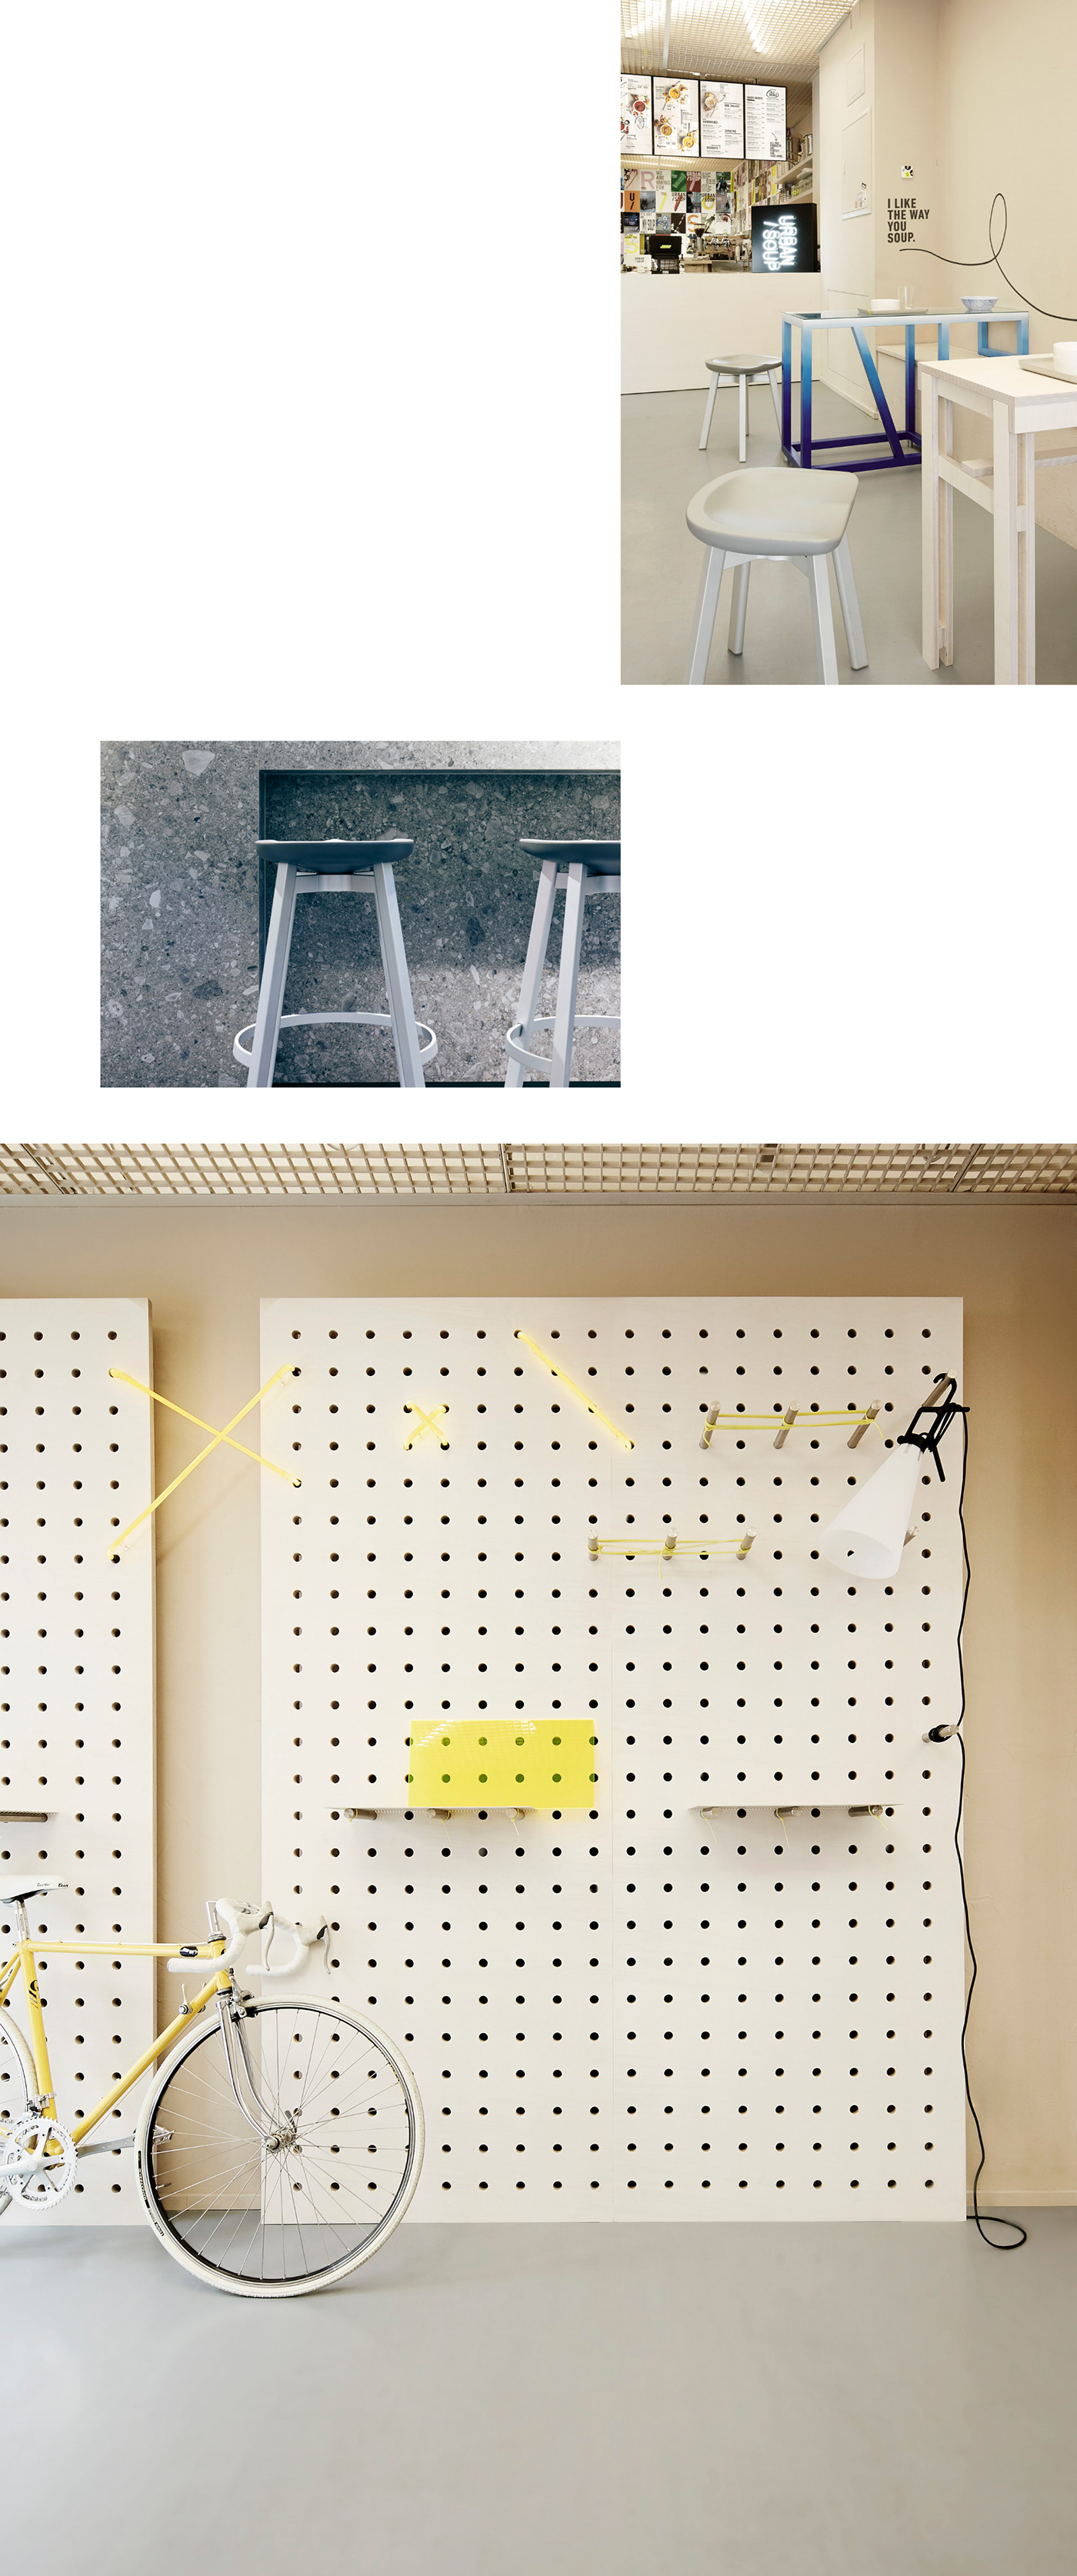 Brand Design concept Corporate Design design digital design furniture design  interior design  modular design munich Retail design